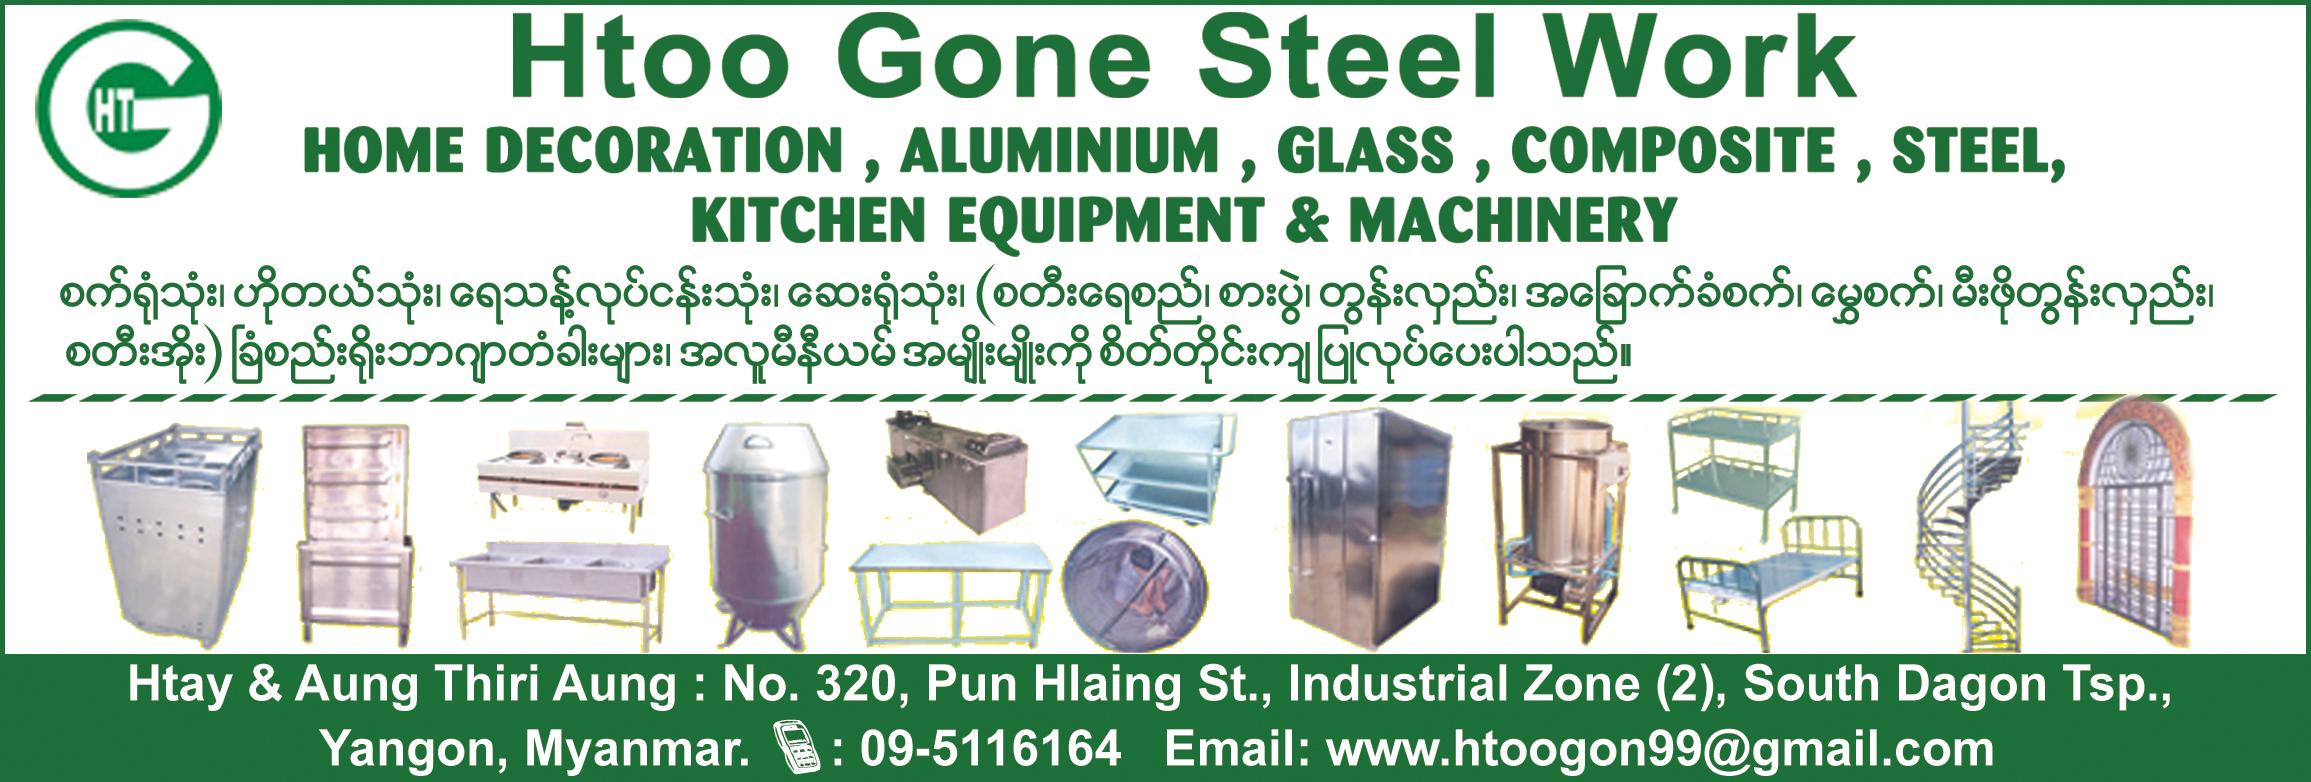 Htoo Gone Steel Work